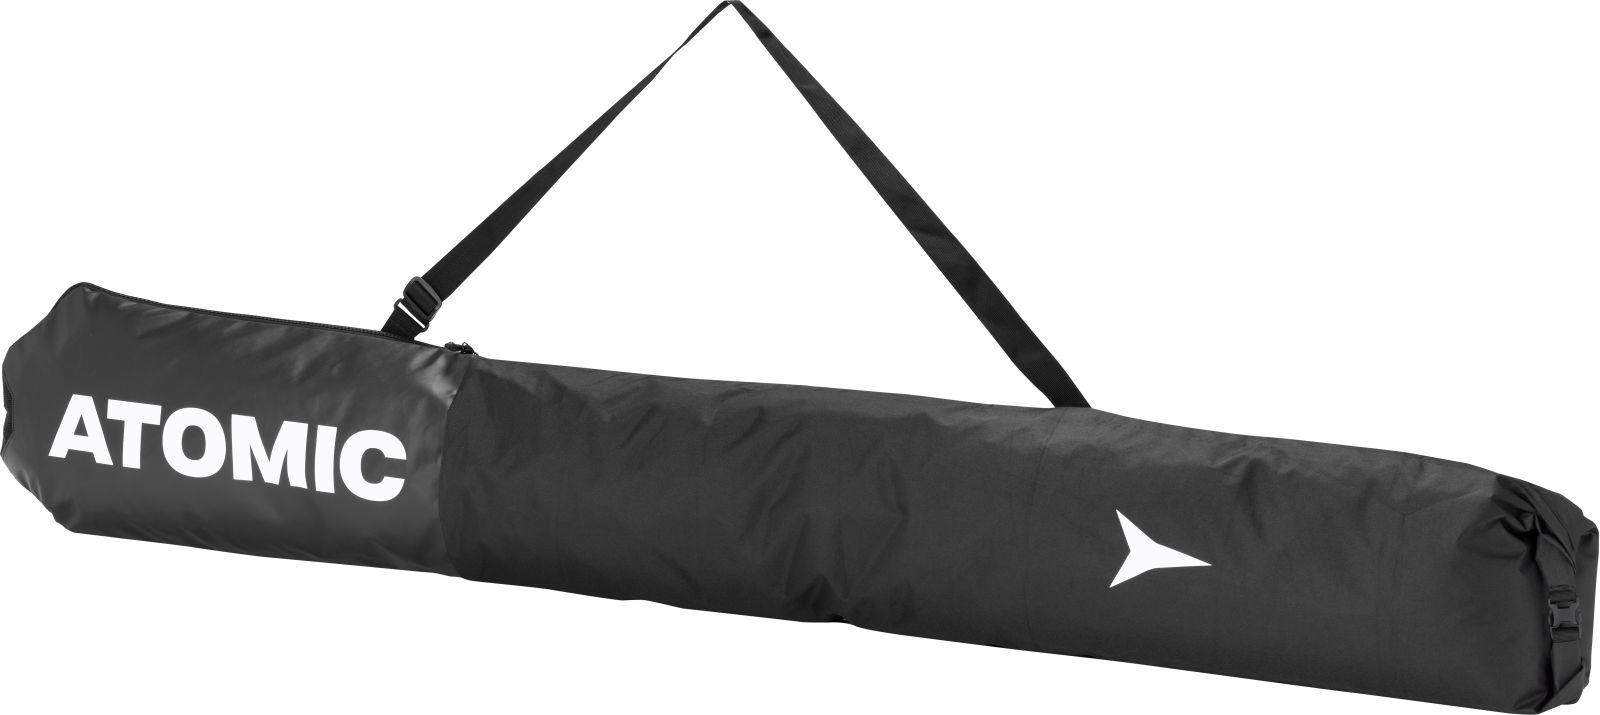 Atomic Ski Sleeve black/white